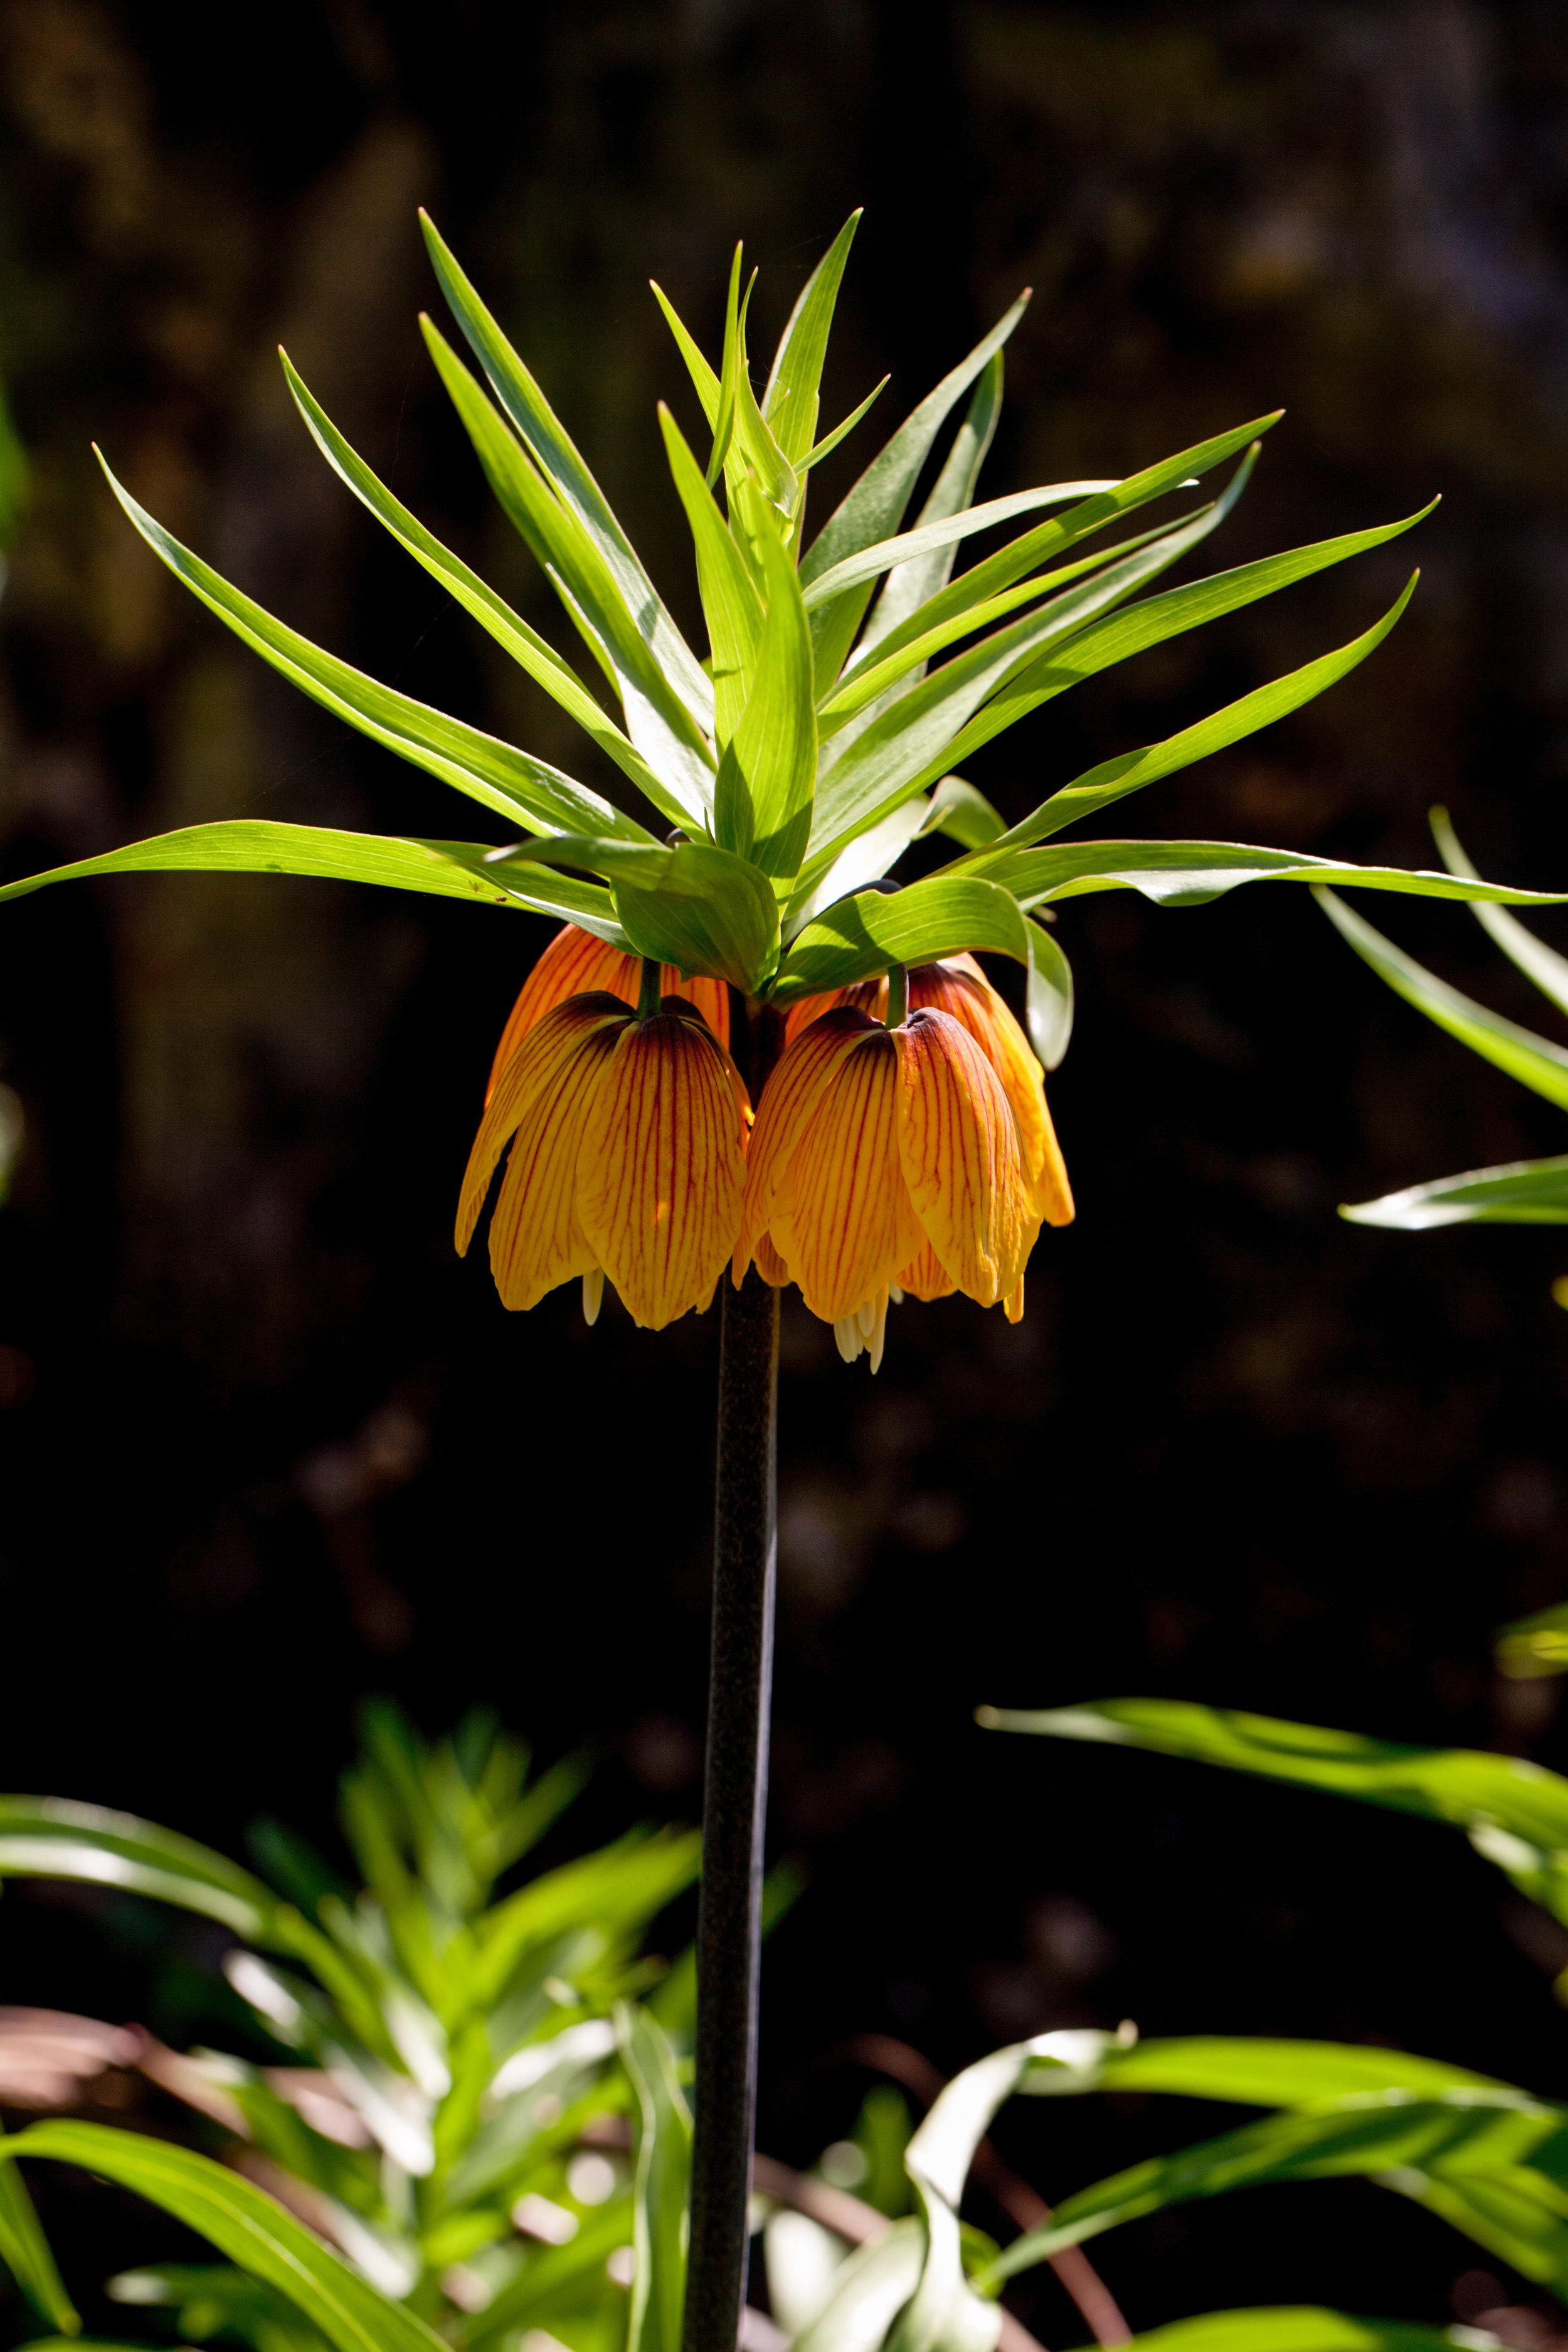 gardening_book_Apr_08_2011_3136.jpg